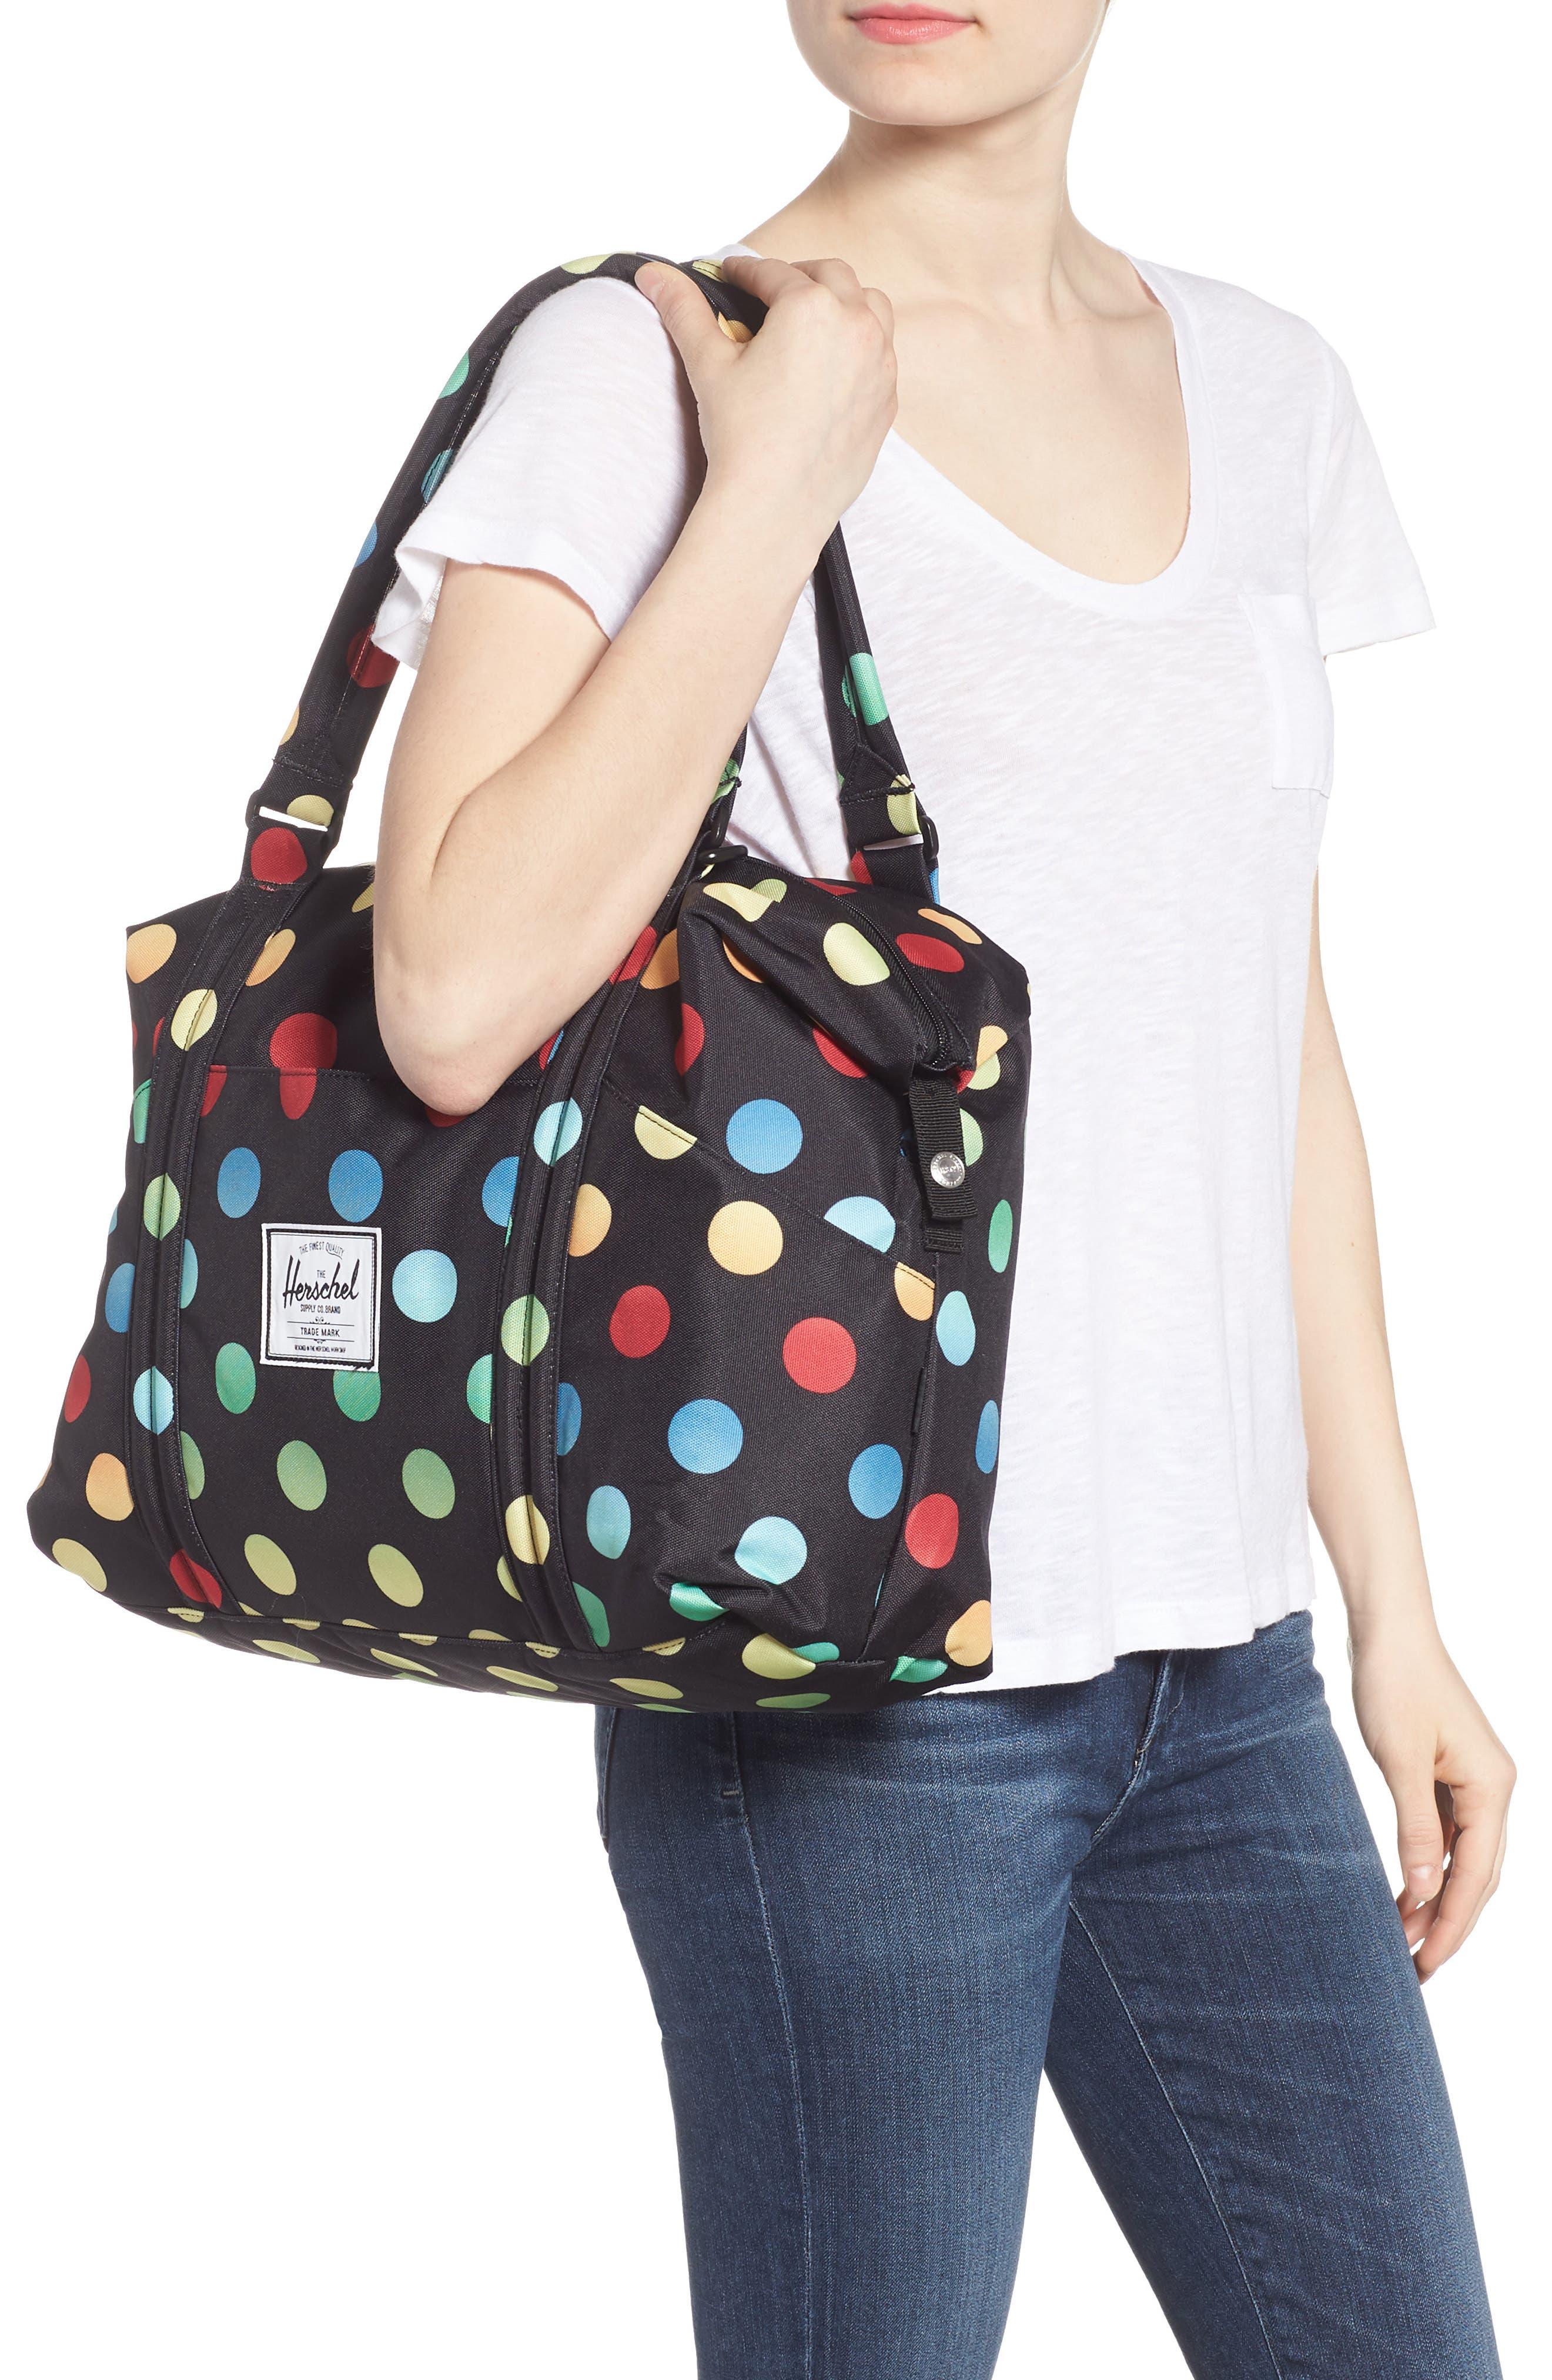 Sprout Diaper Bag,                             Alternate thumbnail 2, color,                             Black Rainbow